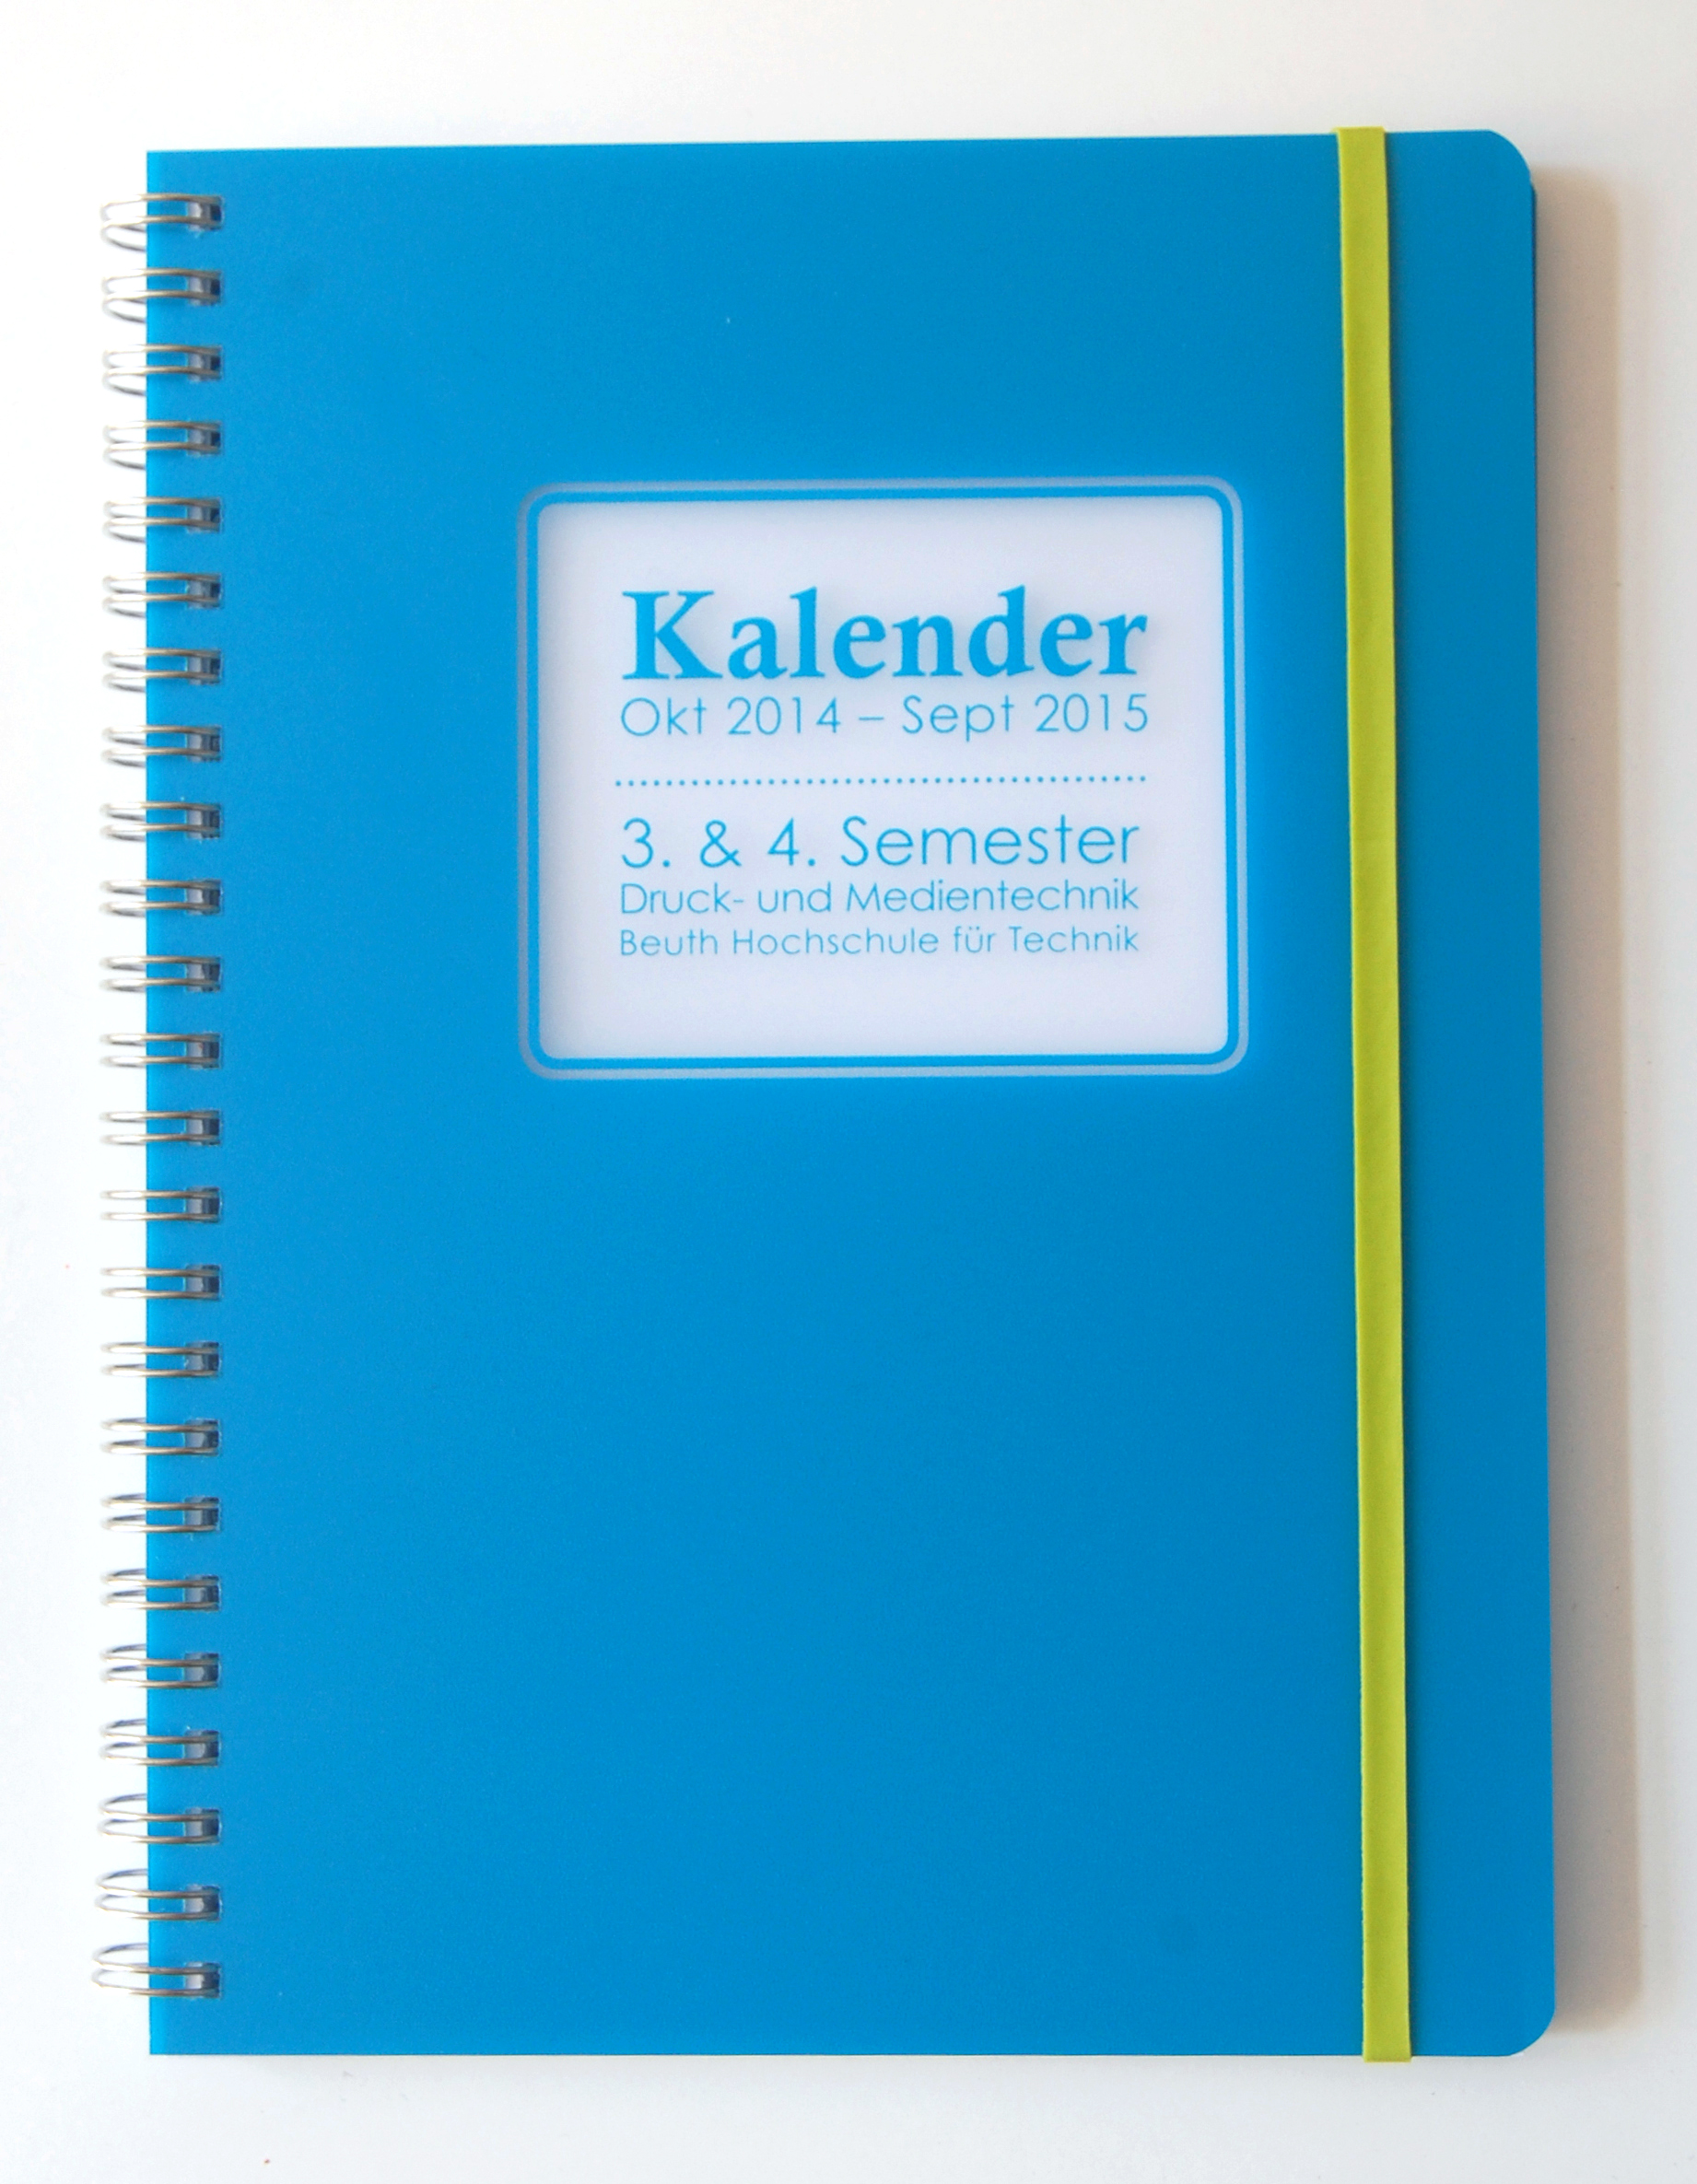 3. & 4. Semester- Kalender